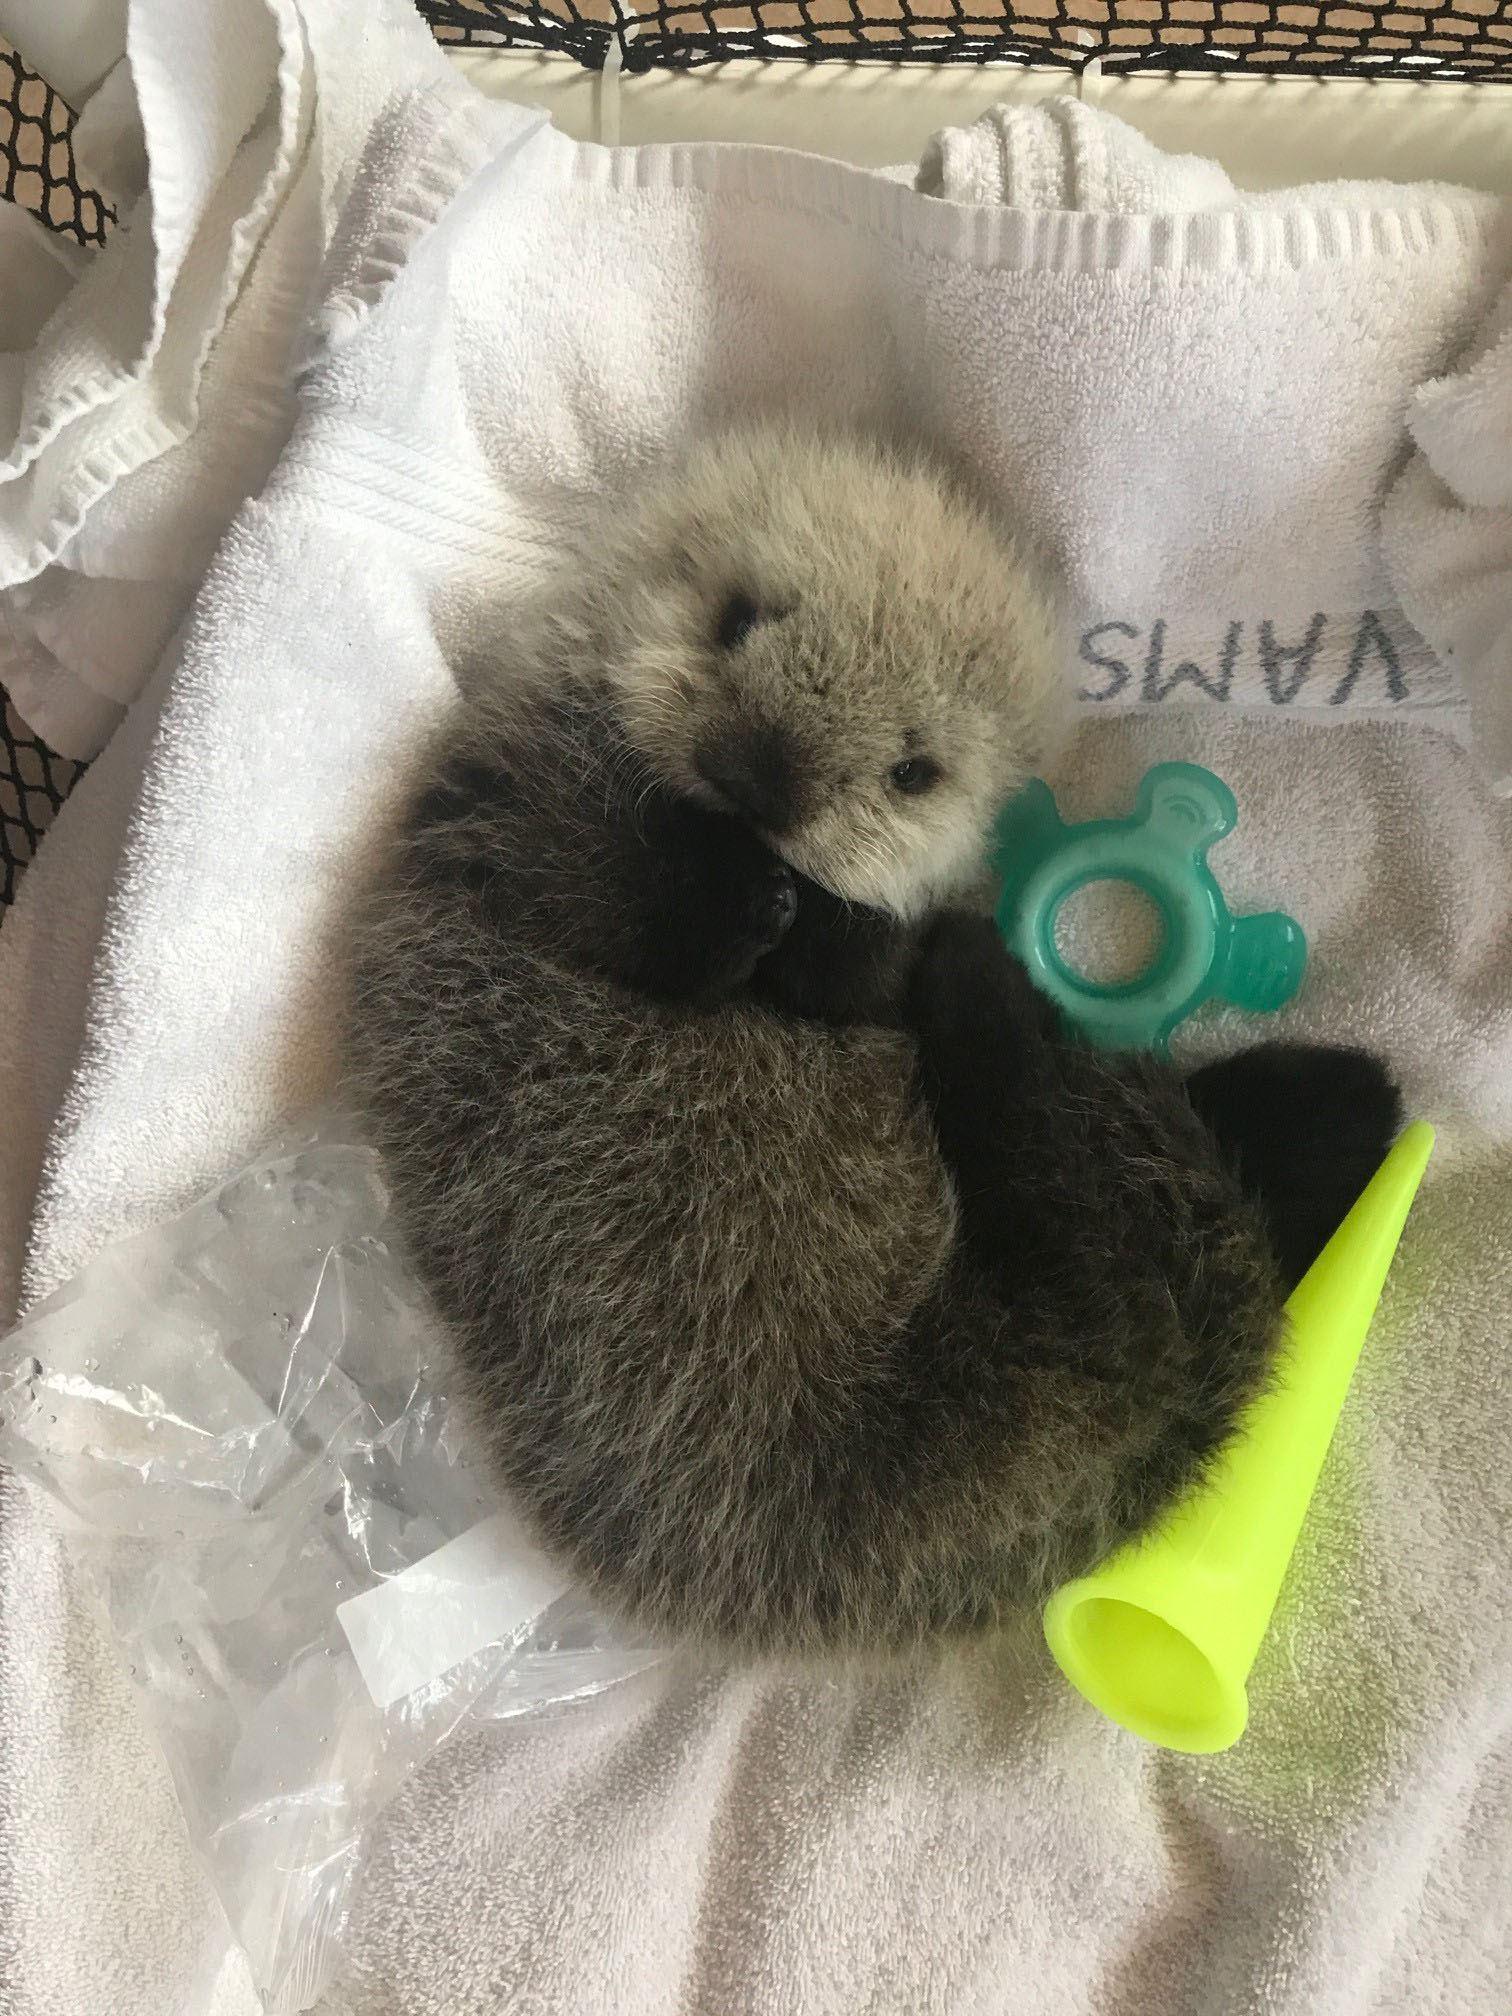 The sea otter in its crib (Vancouver Aquarium)